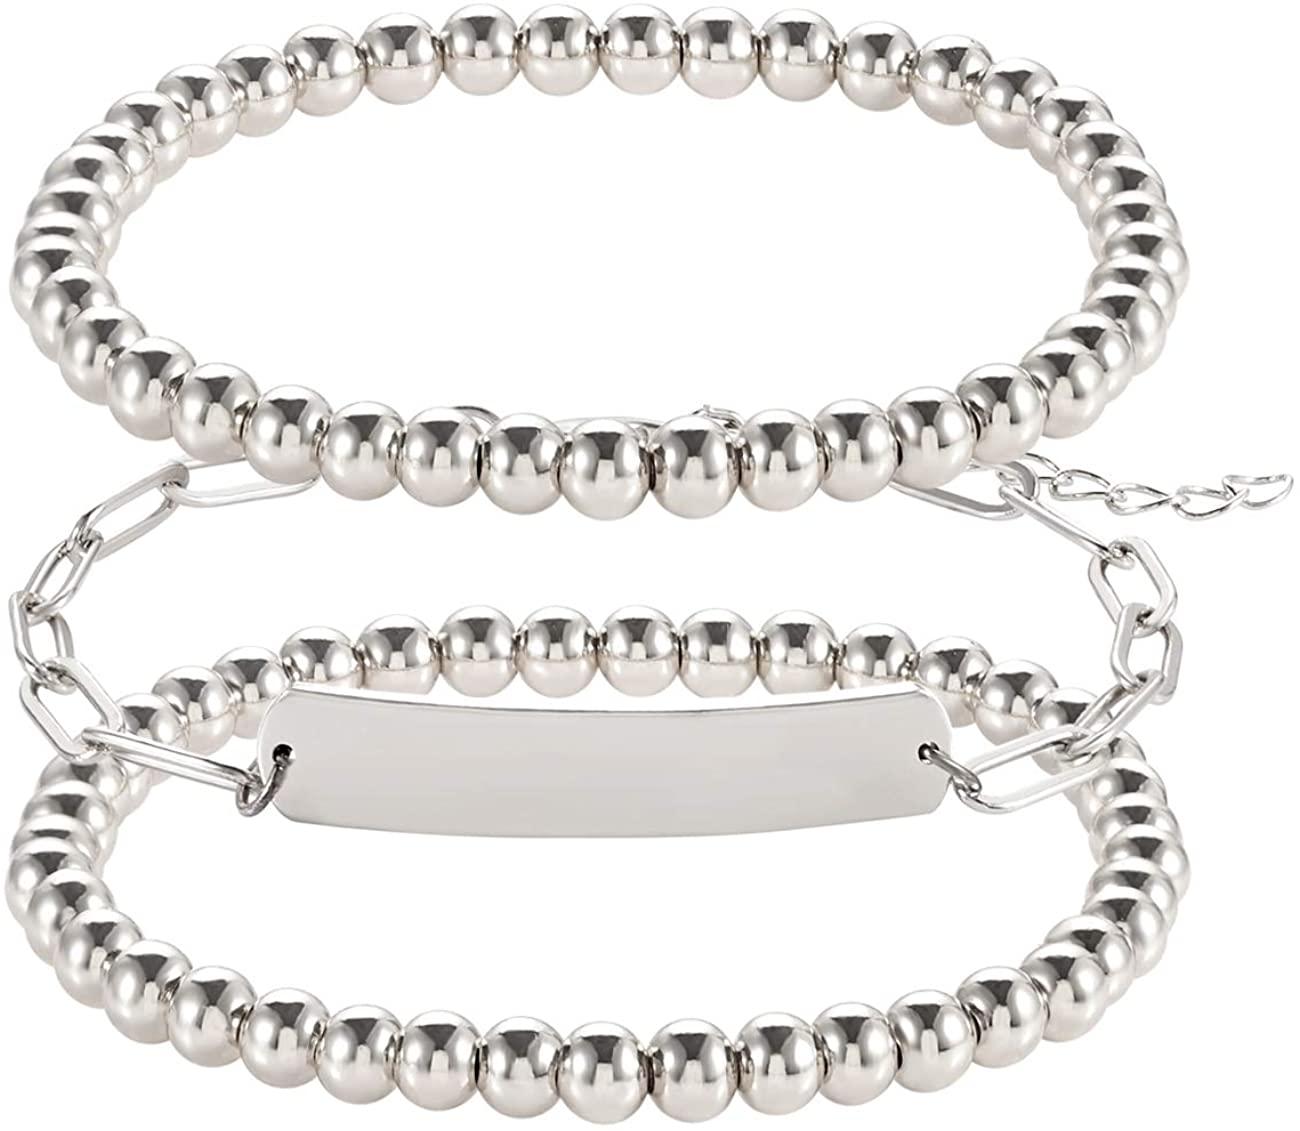 Beaded Bracelets for Women Stackable Stretch Strings Gold Silver Ball Beads Bracelets Paperclip Chain Bar Charm Friendship Bracelets Set for Men Girls